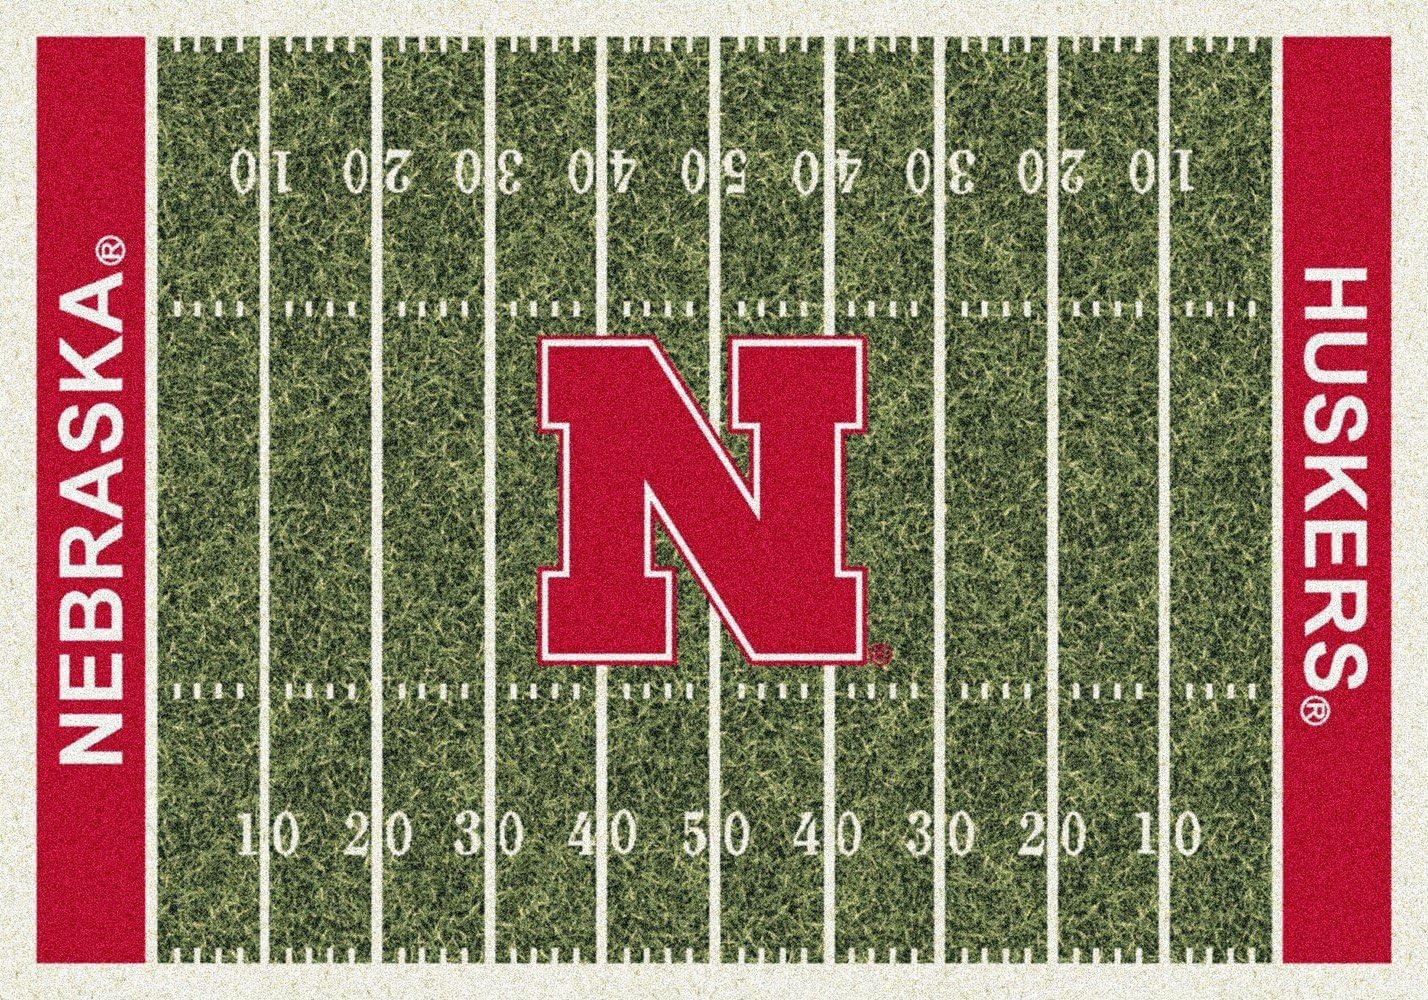 American Floor Mats Nebraska Cornhuskers NCAA College Home Field Team Area Rug 5 4 x7 8